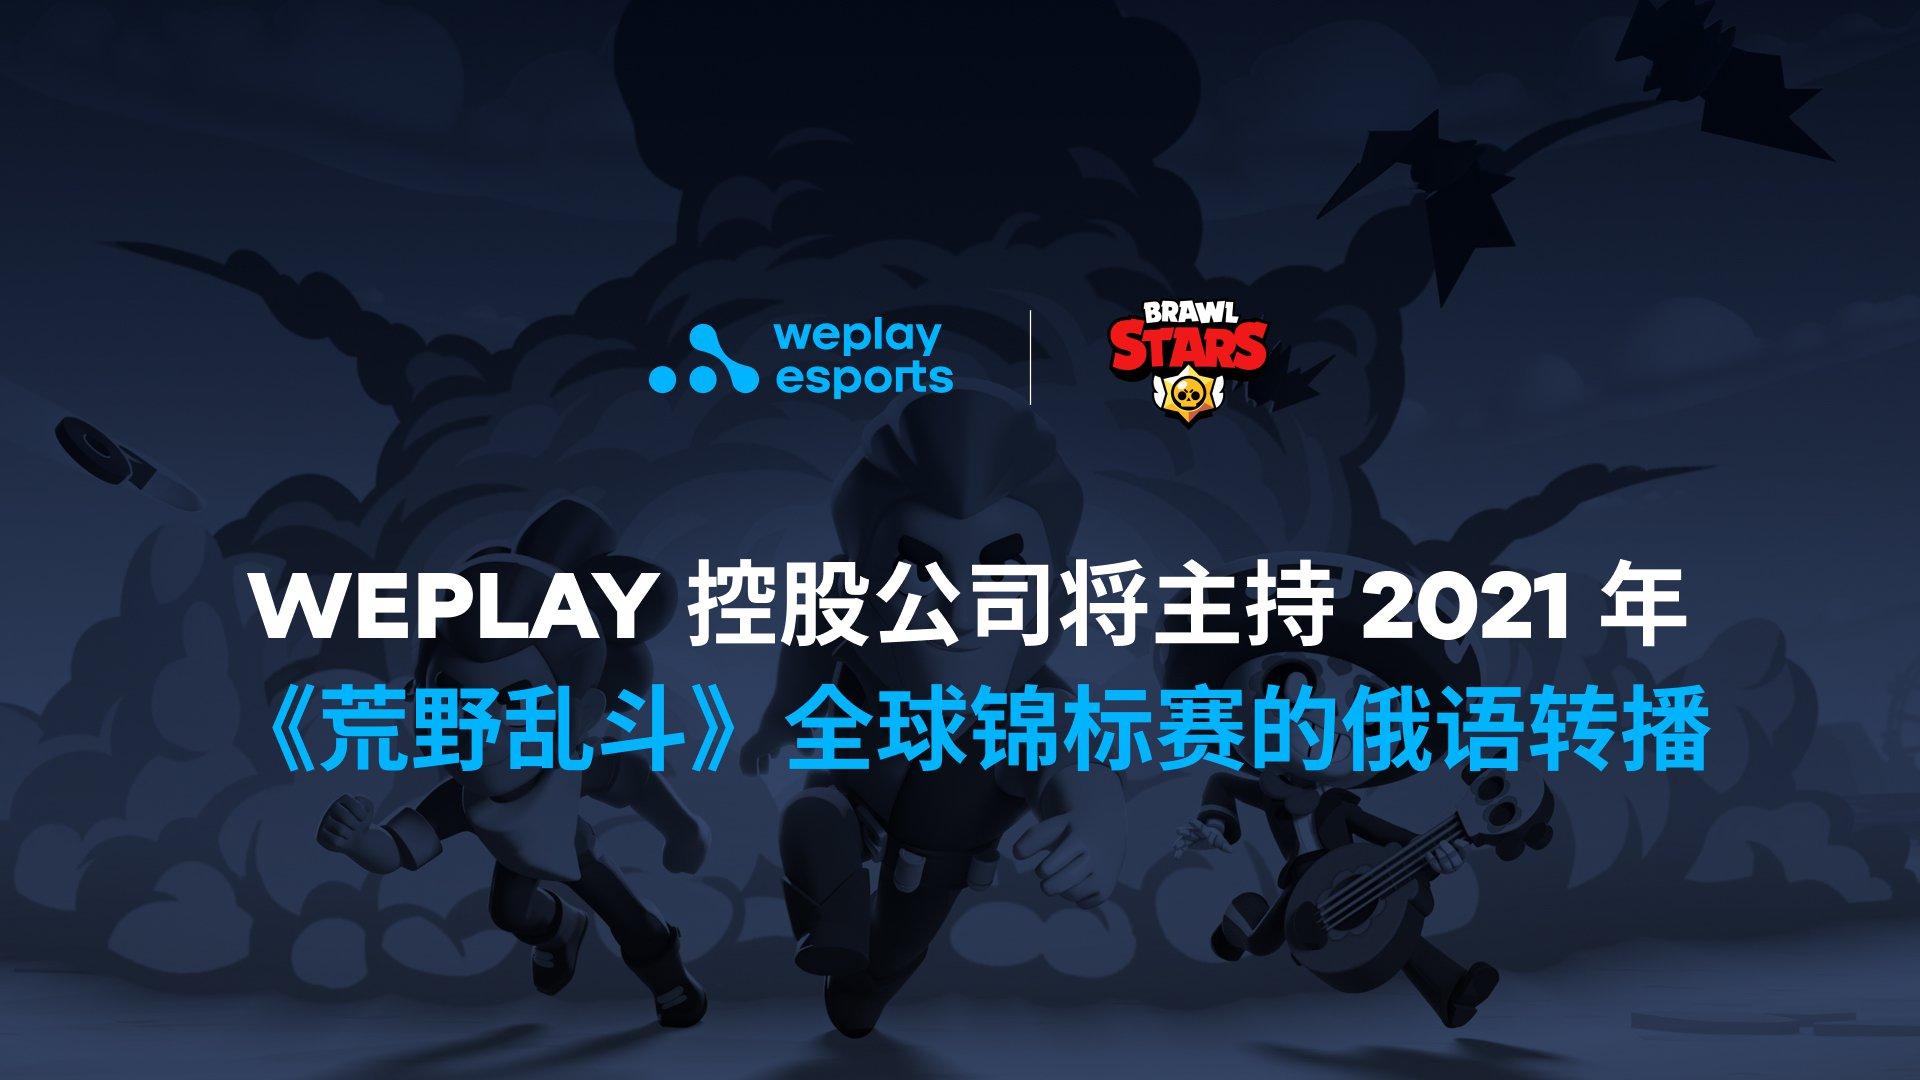 WePlay 控股公司将主持 Supercell 举办的《荒野乱斗》全球锦标赛的用俄语转播。 图像: WePlay Holding